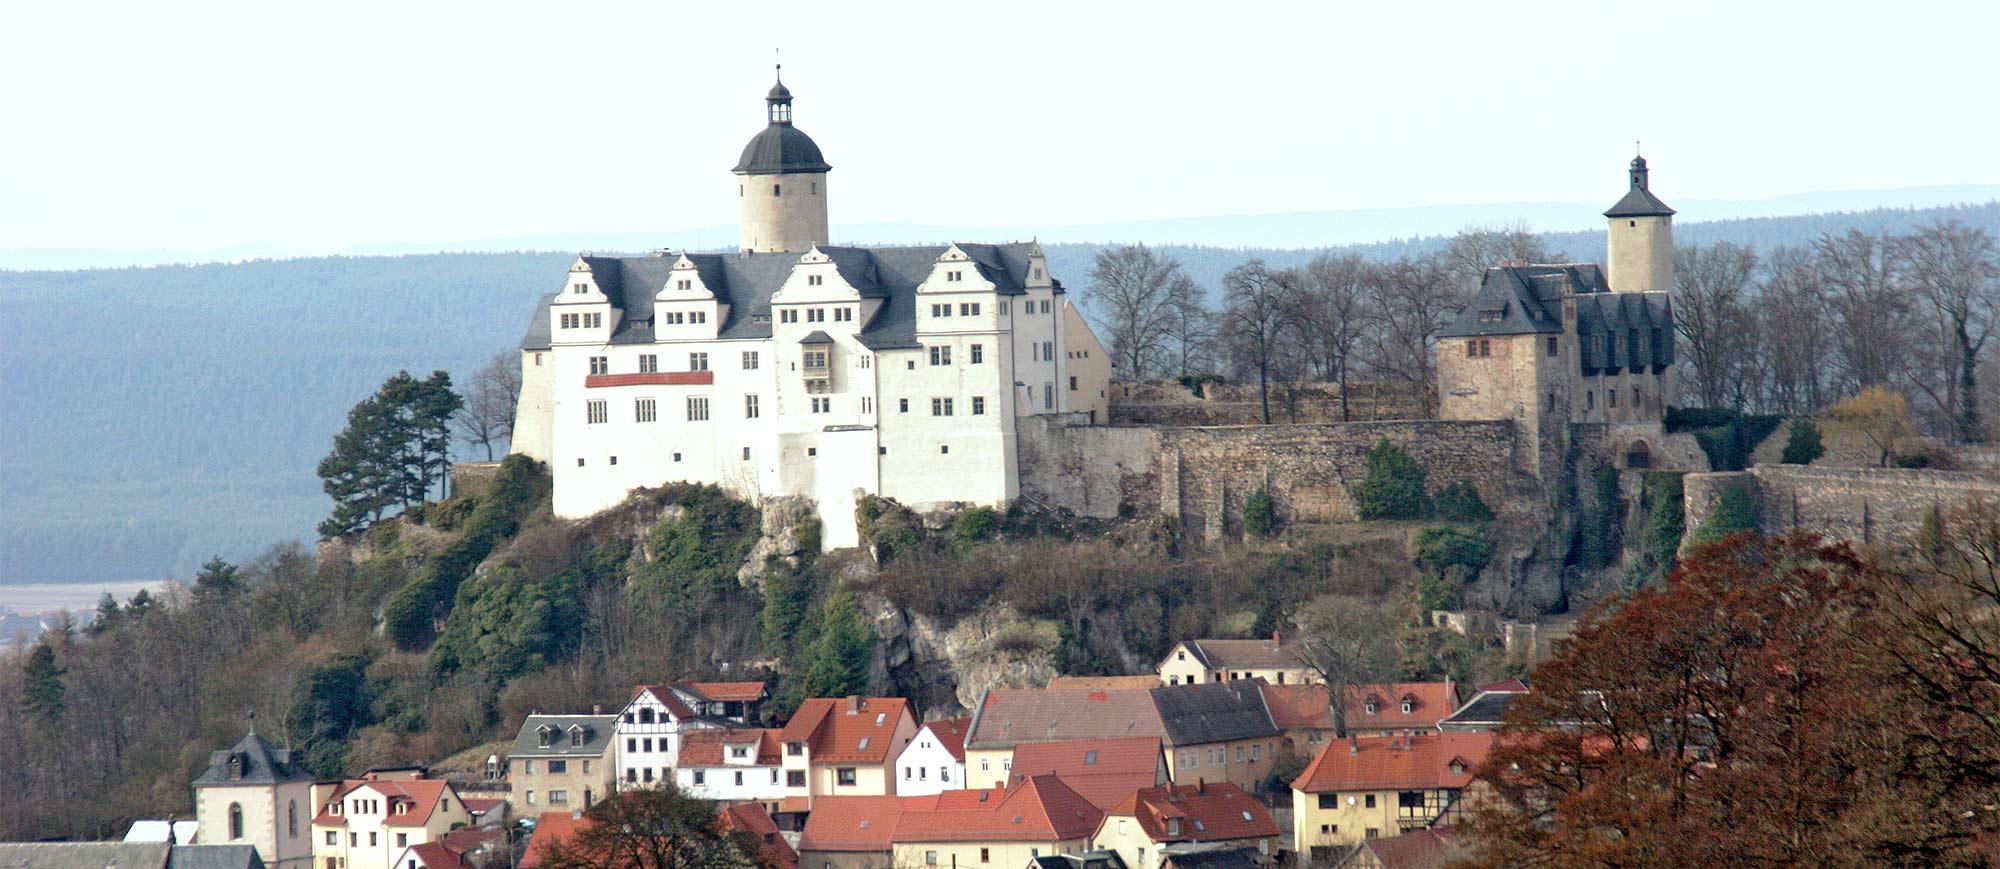 Burg Ranis Panorama